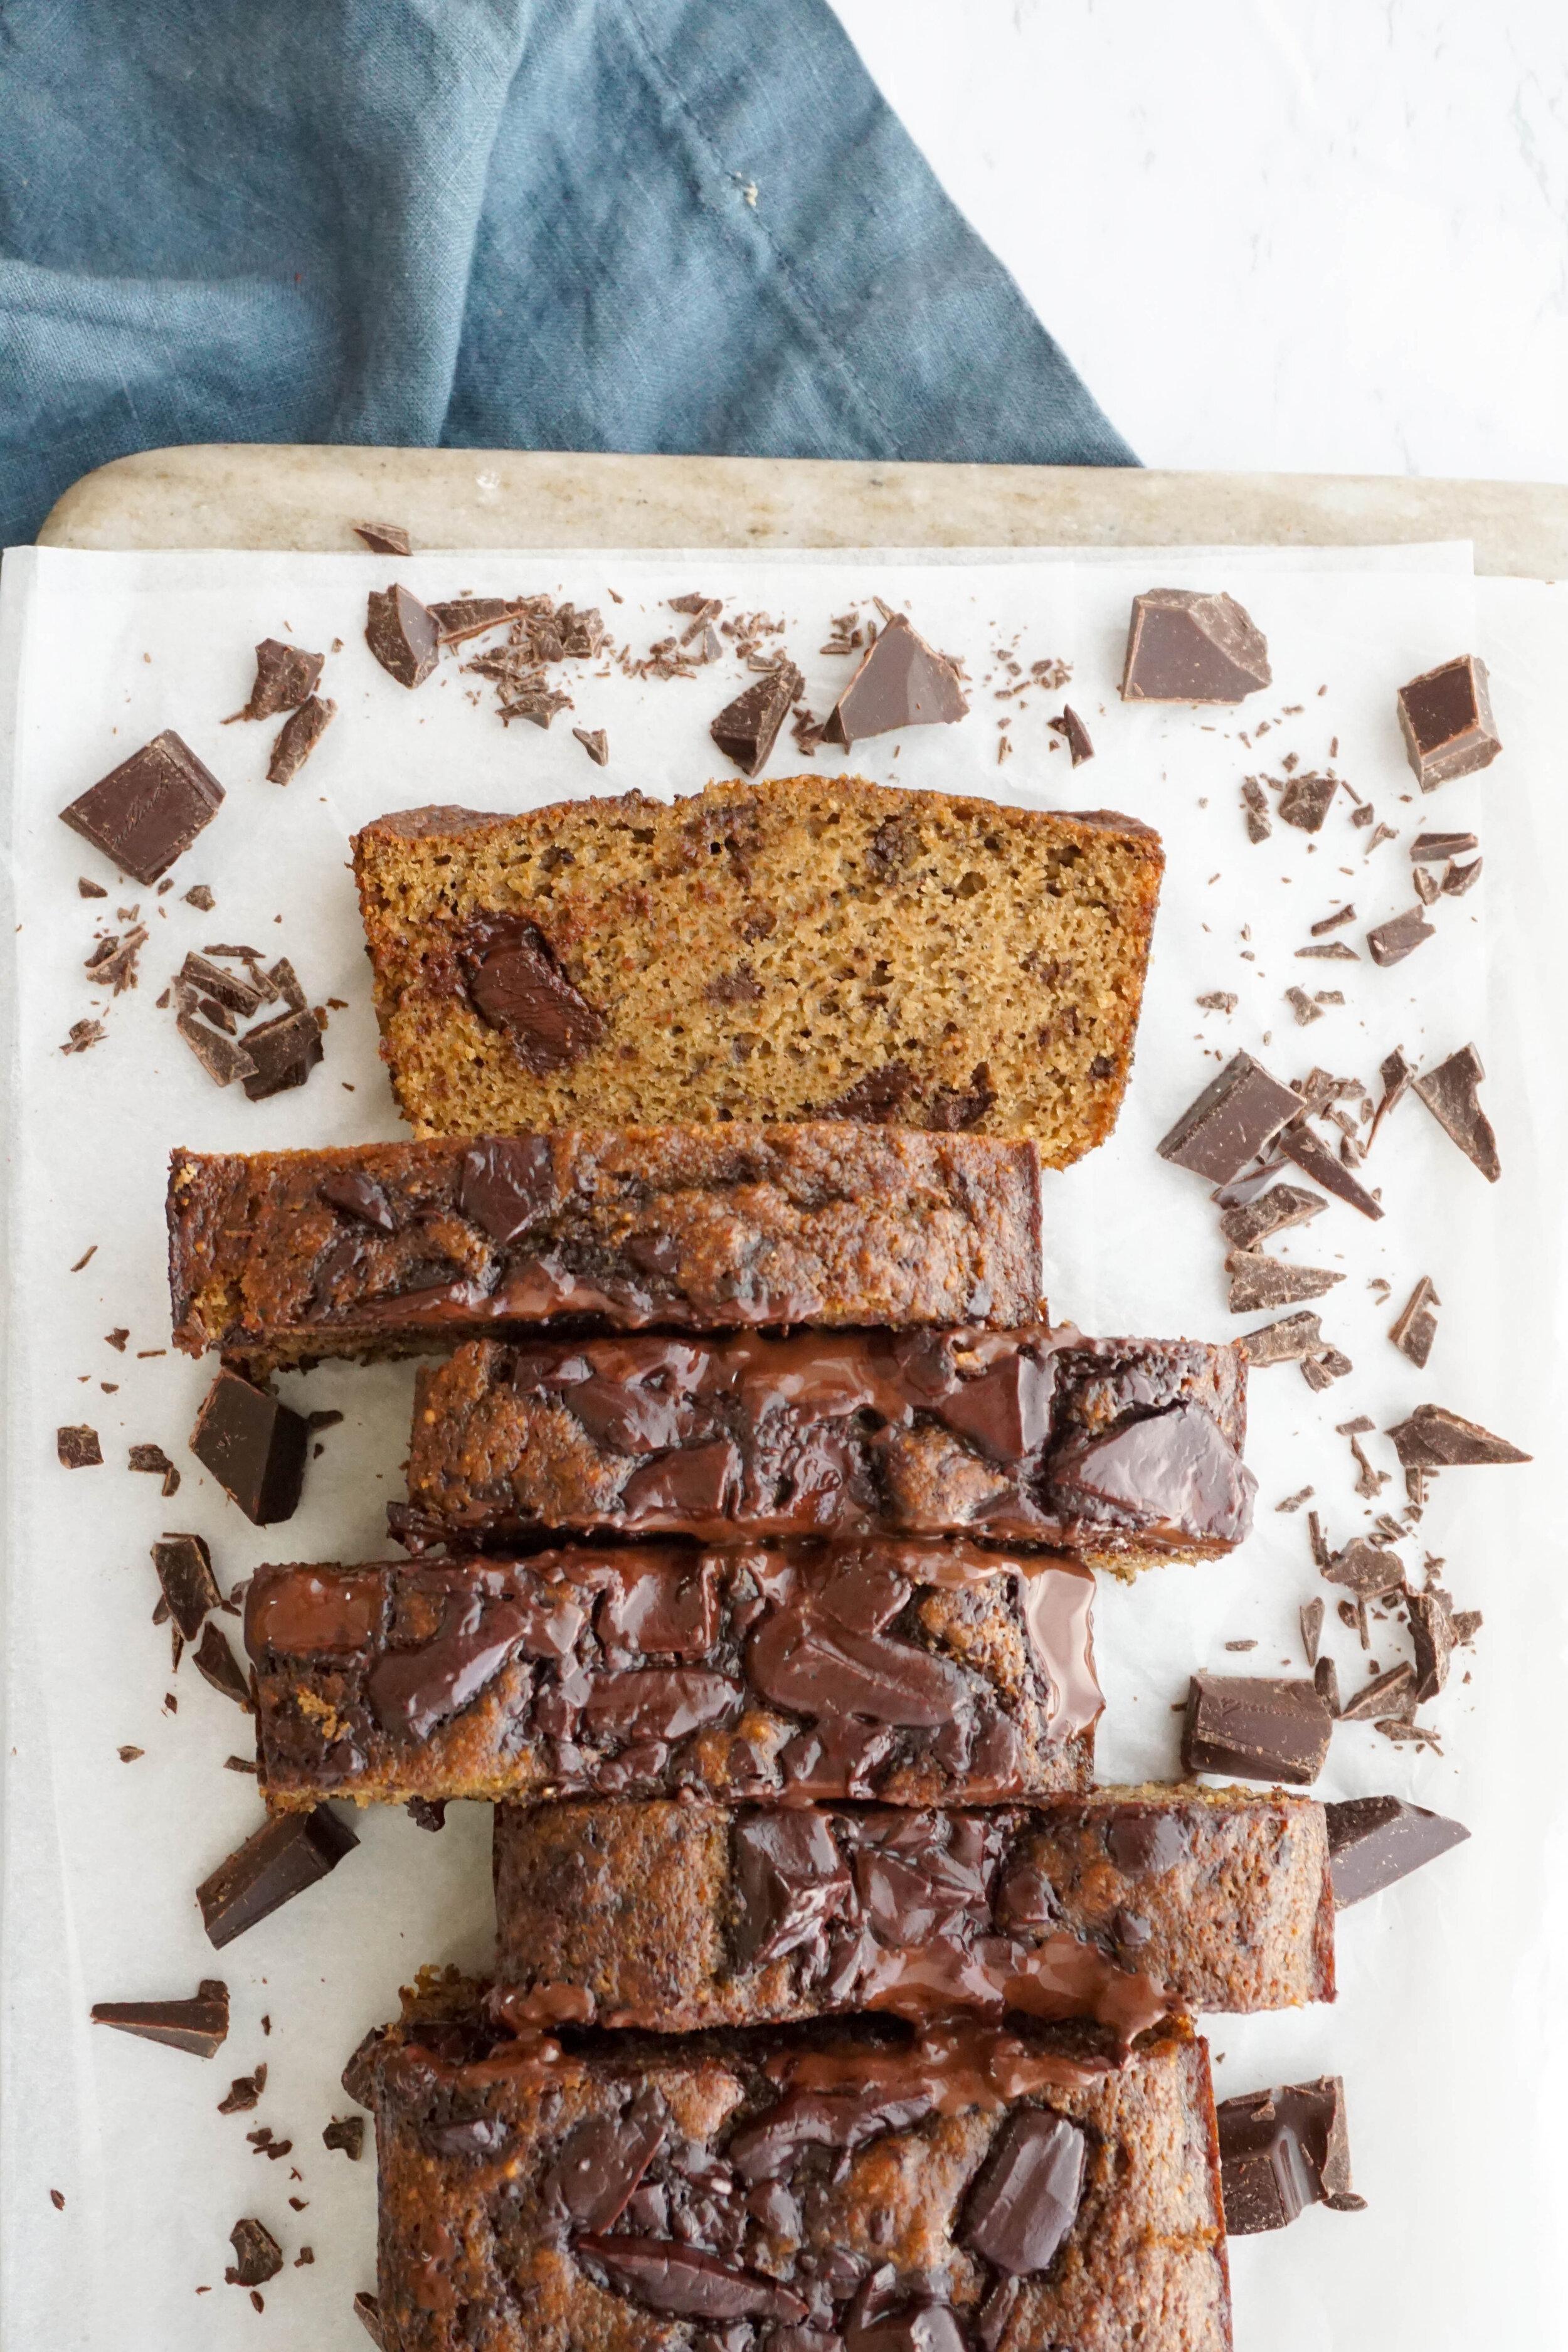 Vanilla Almond Chocolate Chip Banana Bread (Grain-free, Dairy-free)